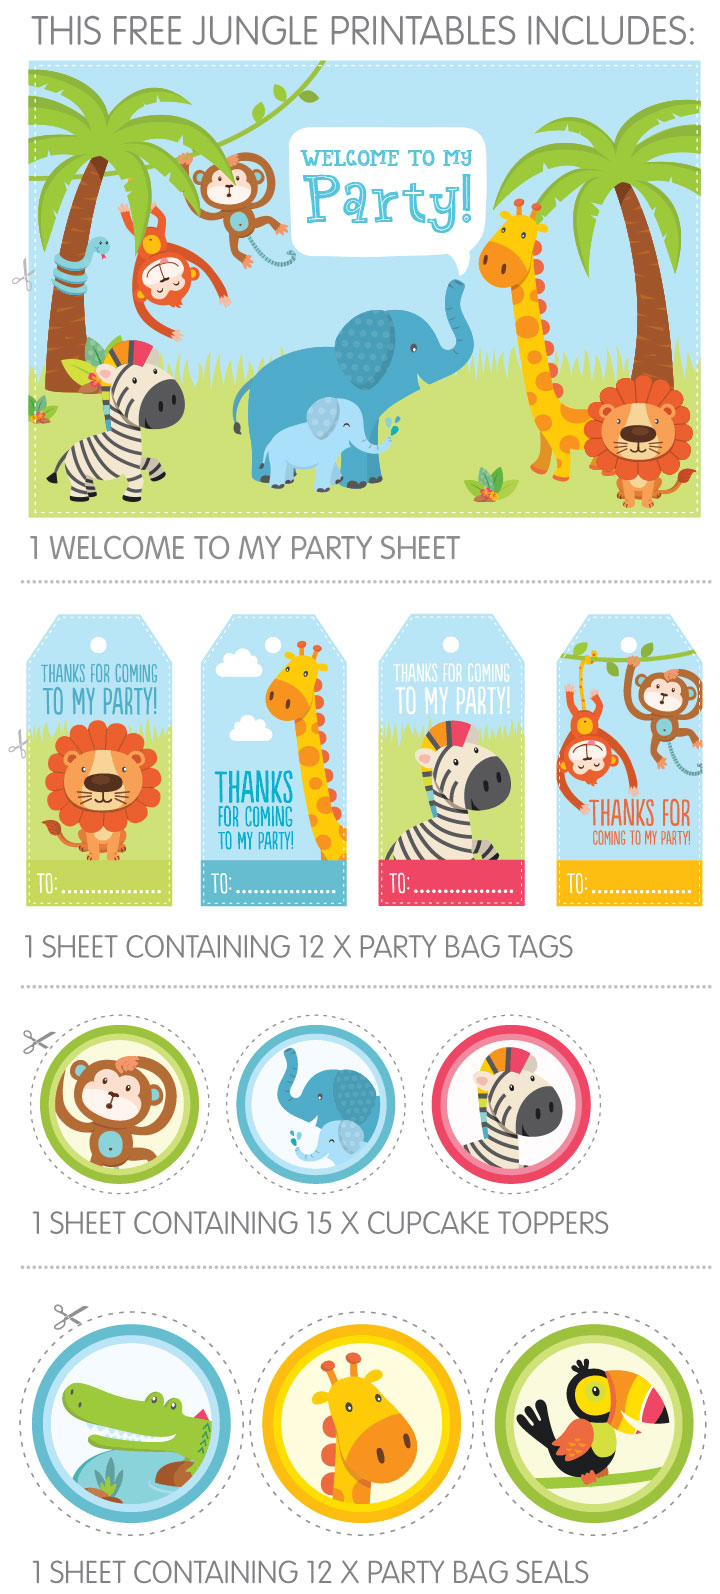 Free Jungle Party Invitation Printables - Free Printable Animal Print Birthday Invitations